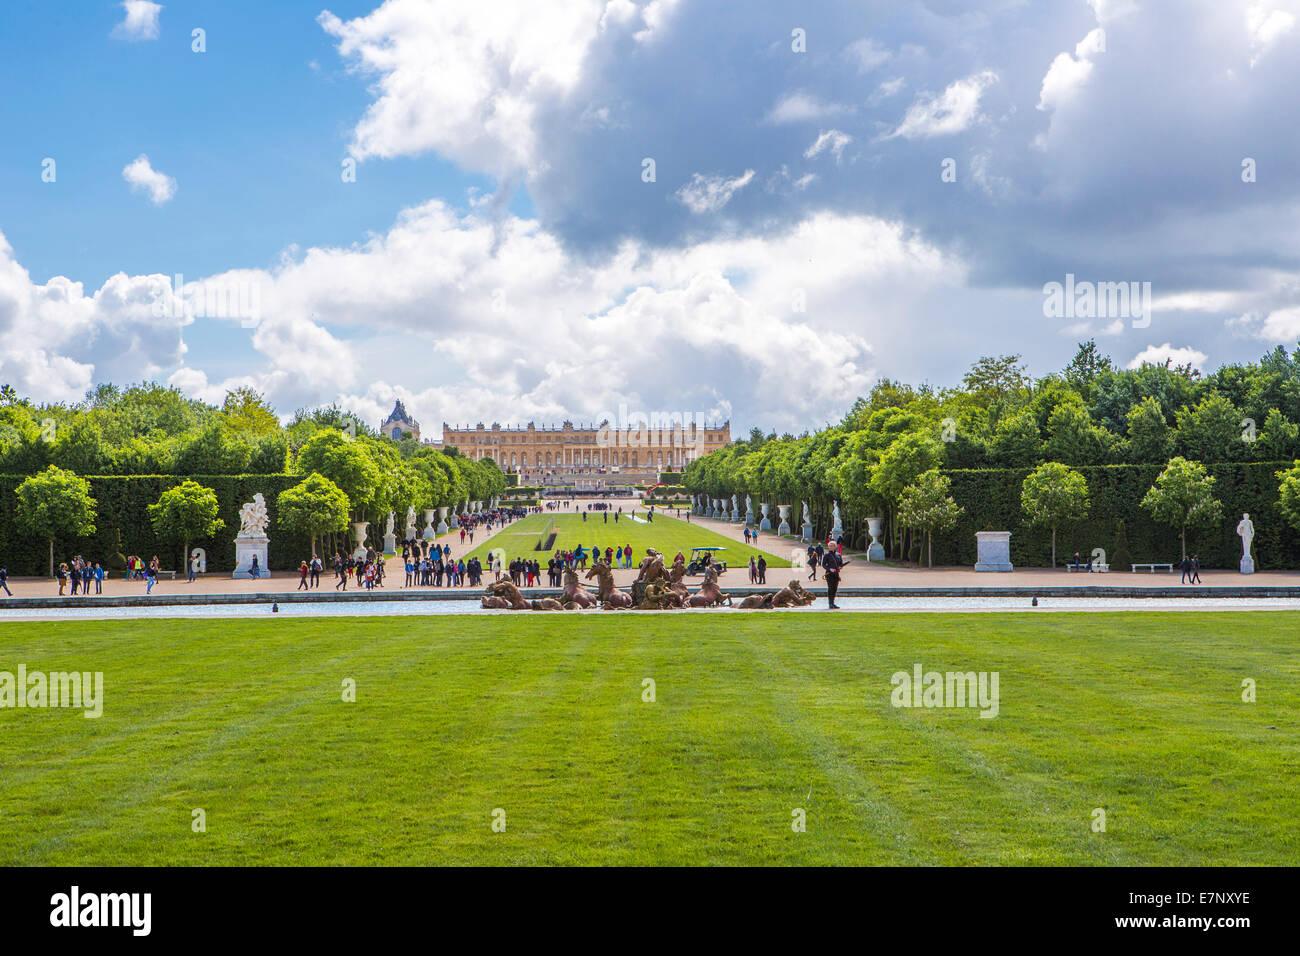 City, France, Palace, Versailles, World Heritage, Gardens, Grass, Green